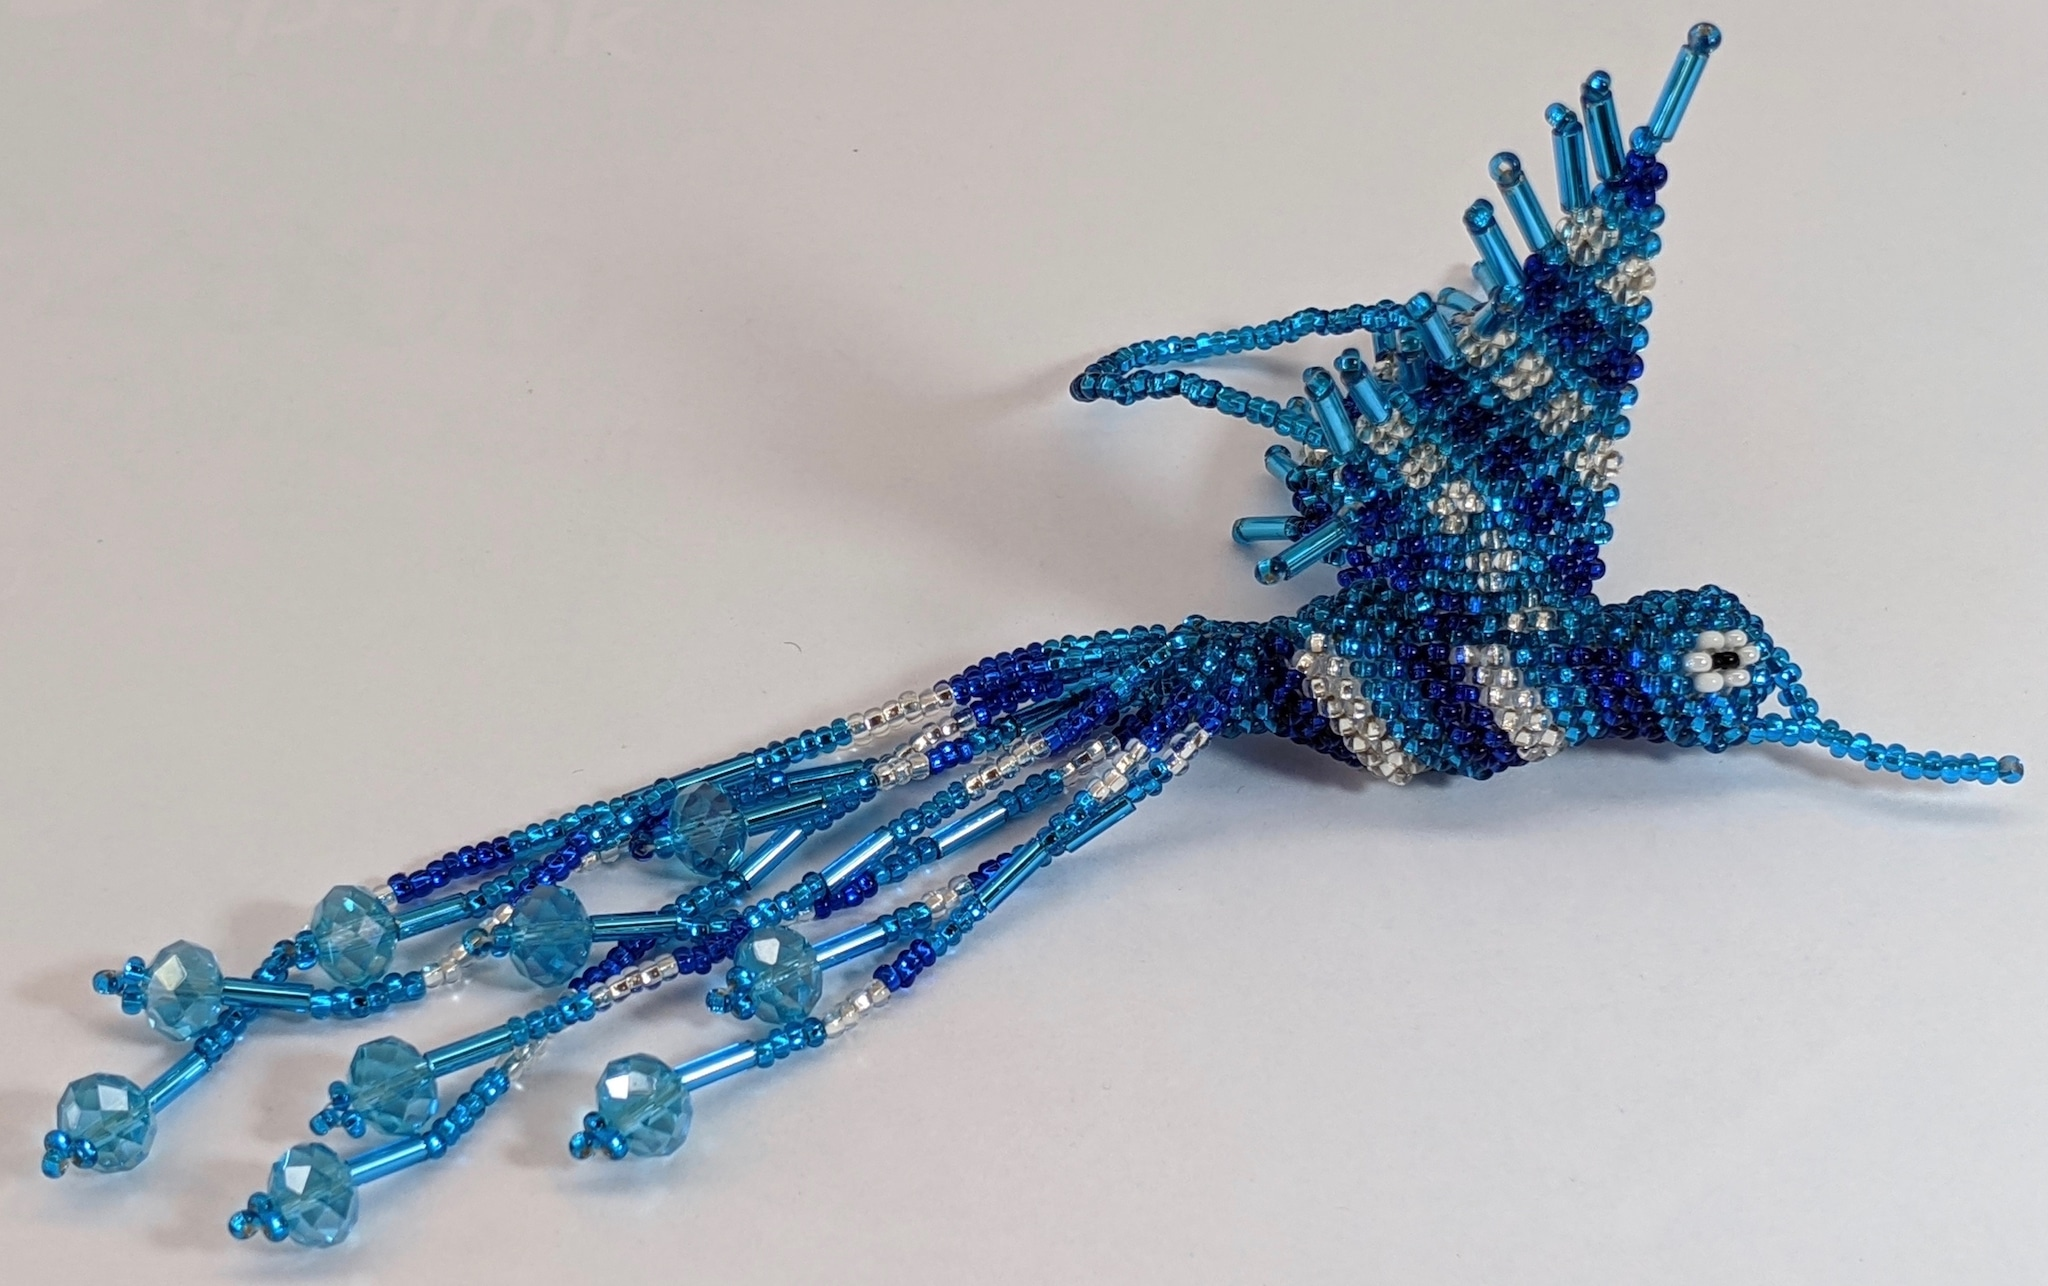 Hummingbird Beaded Ornament - Sapphire Blue, Celestial Blue, and Silver White